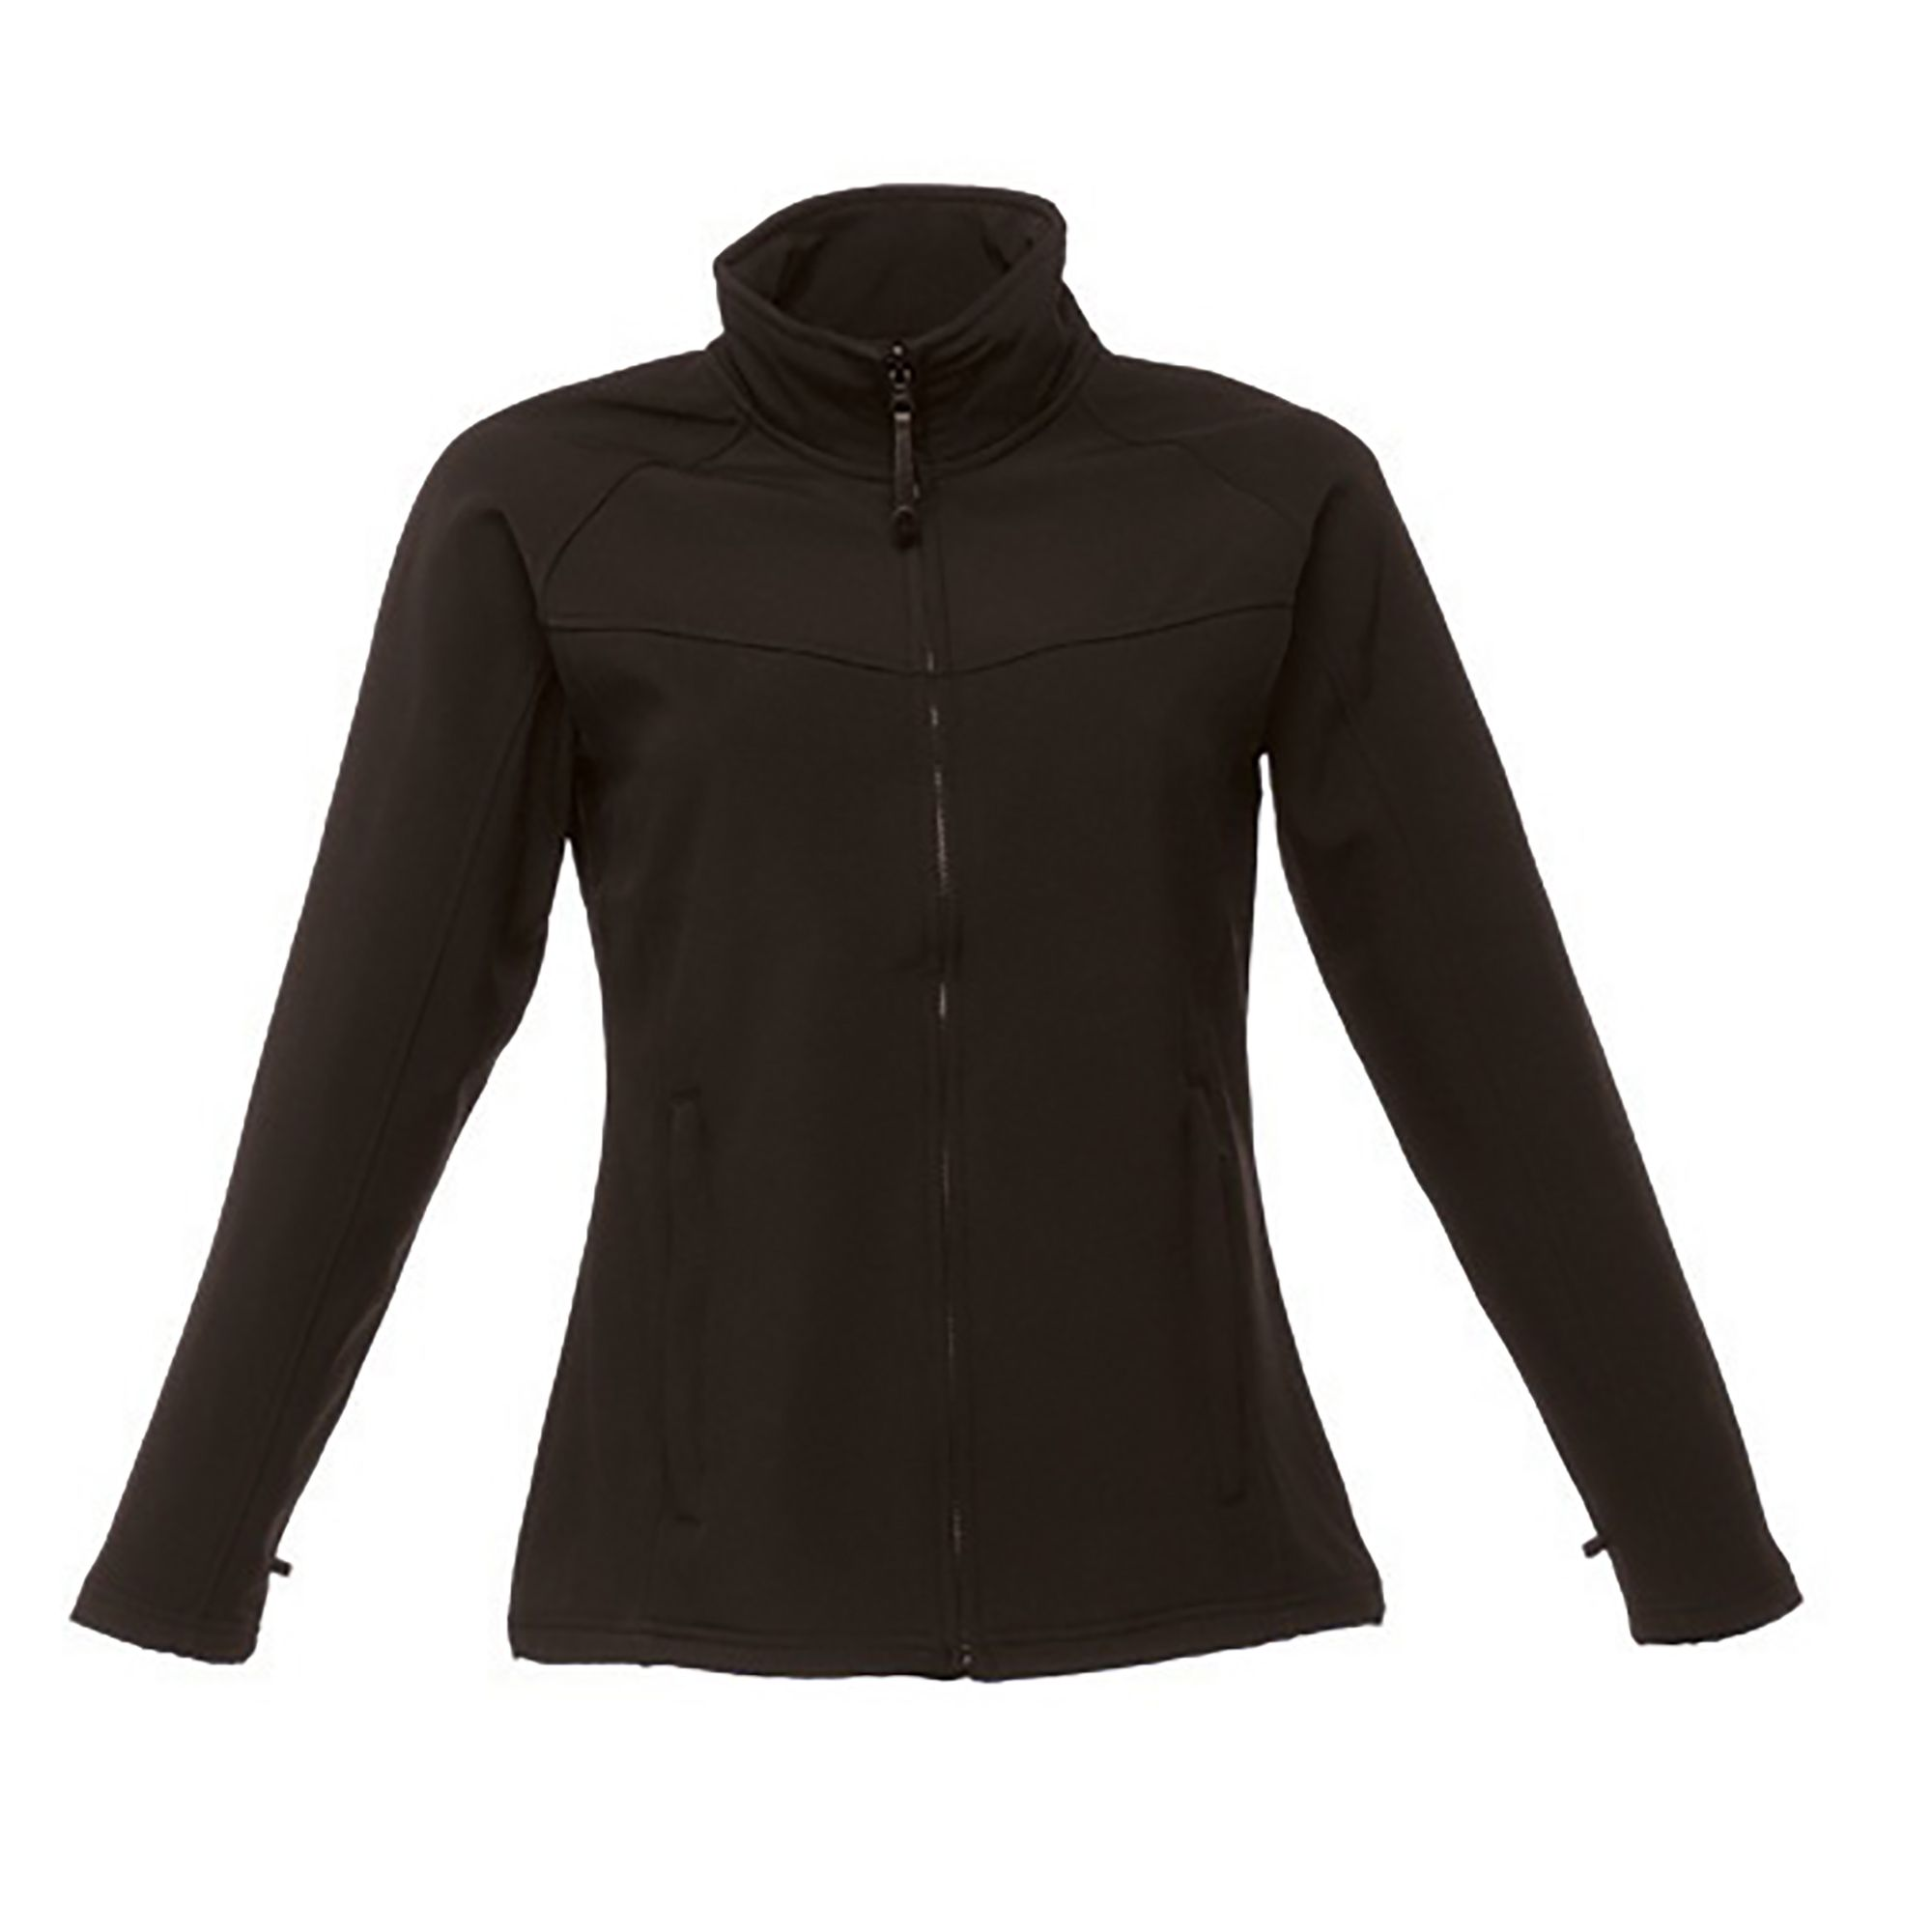 Regatta Ladies Uproar Softshell Wind Resistant Jacket